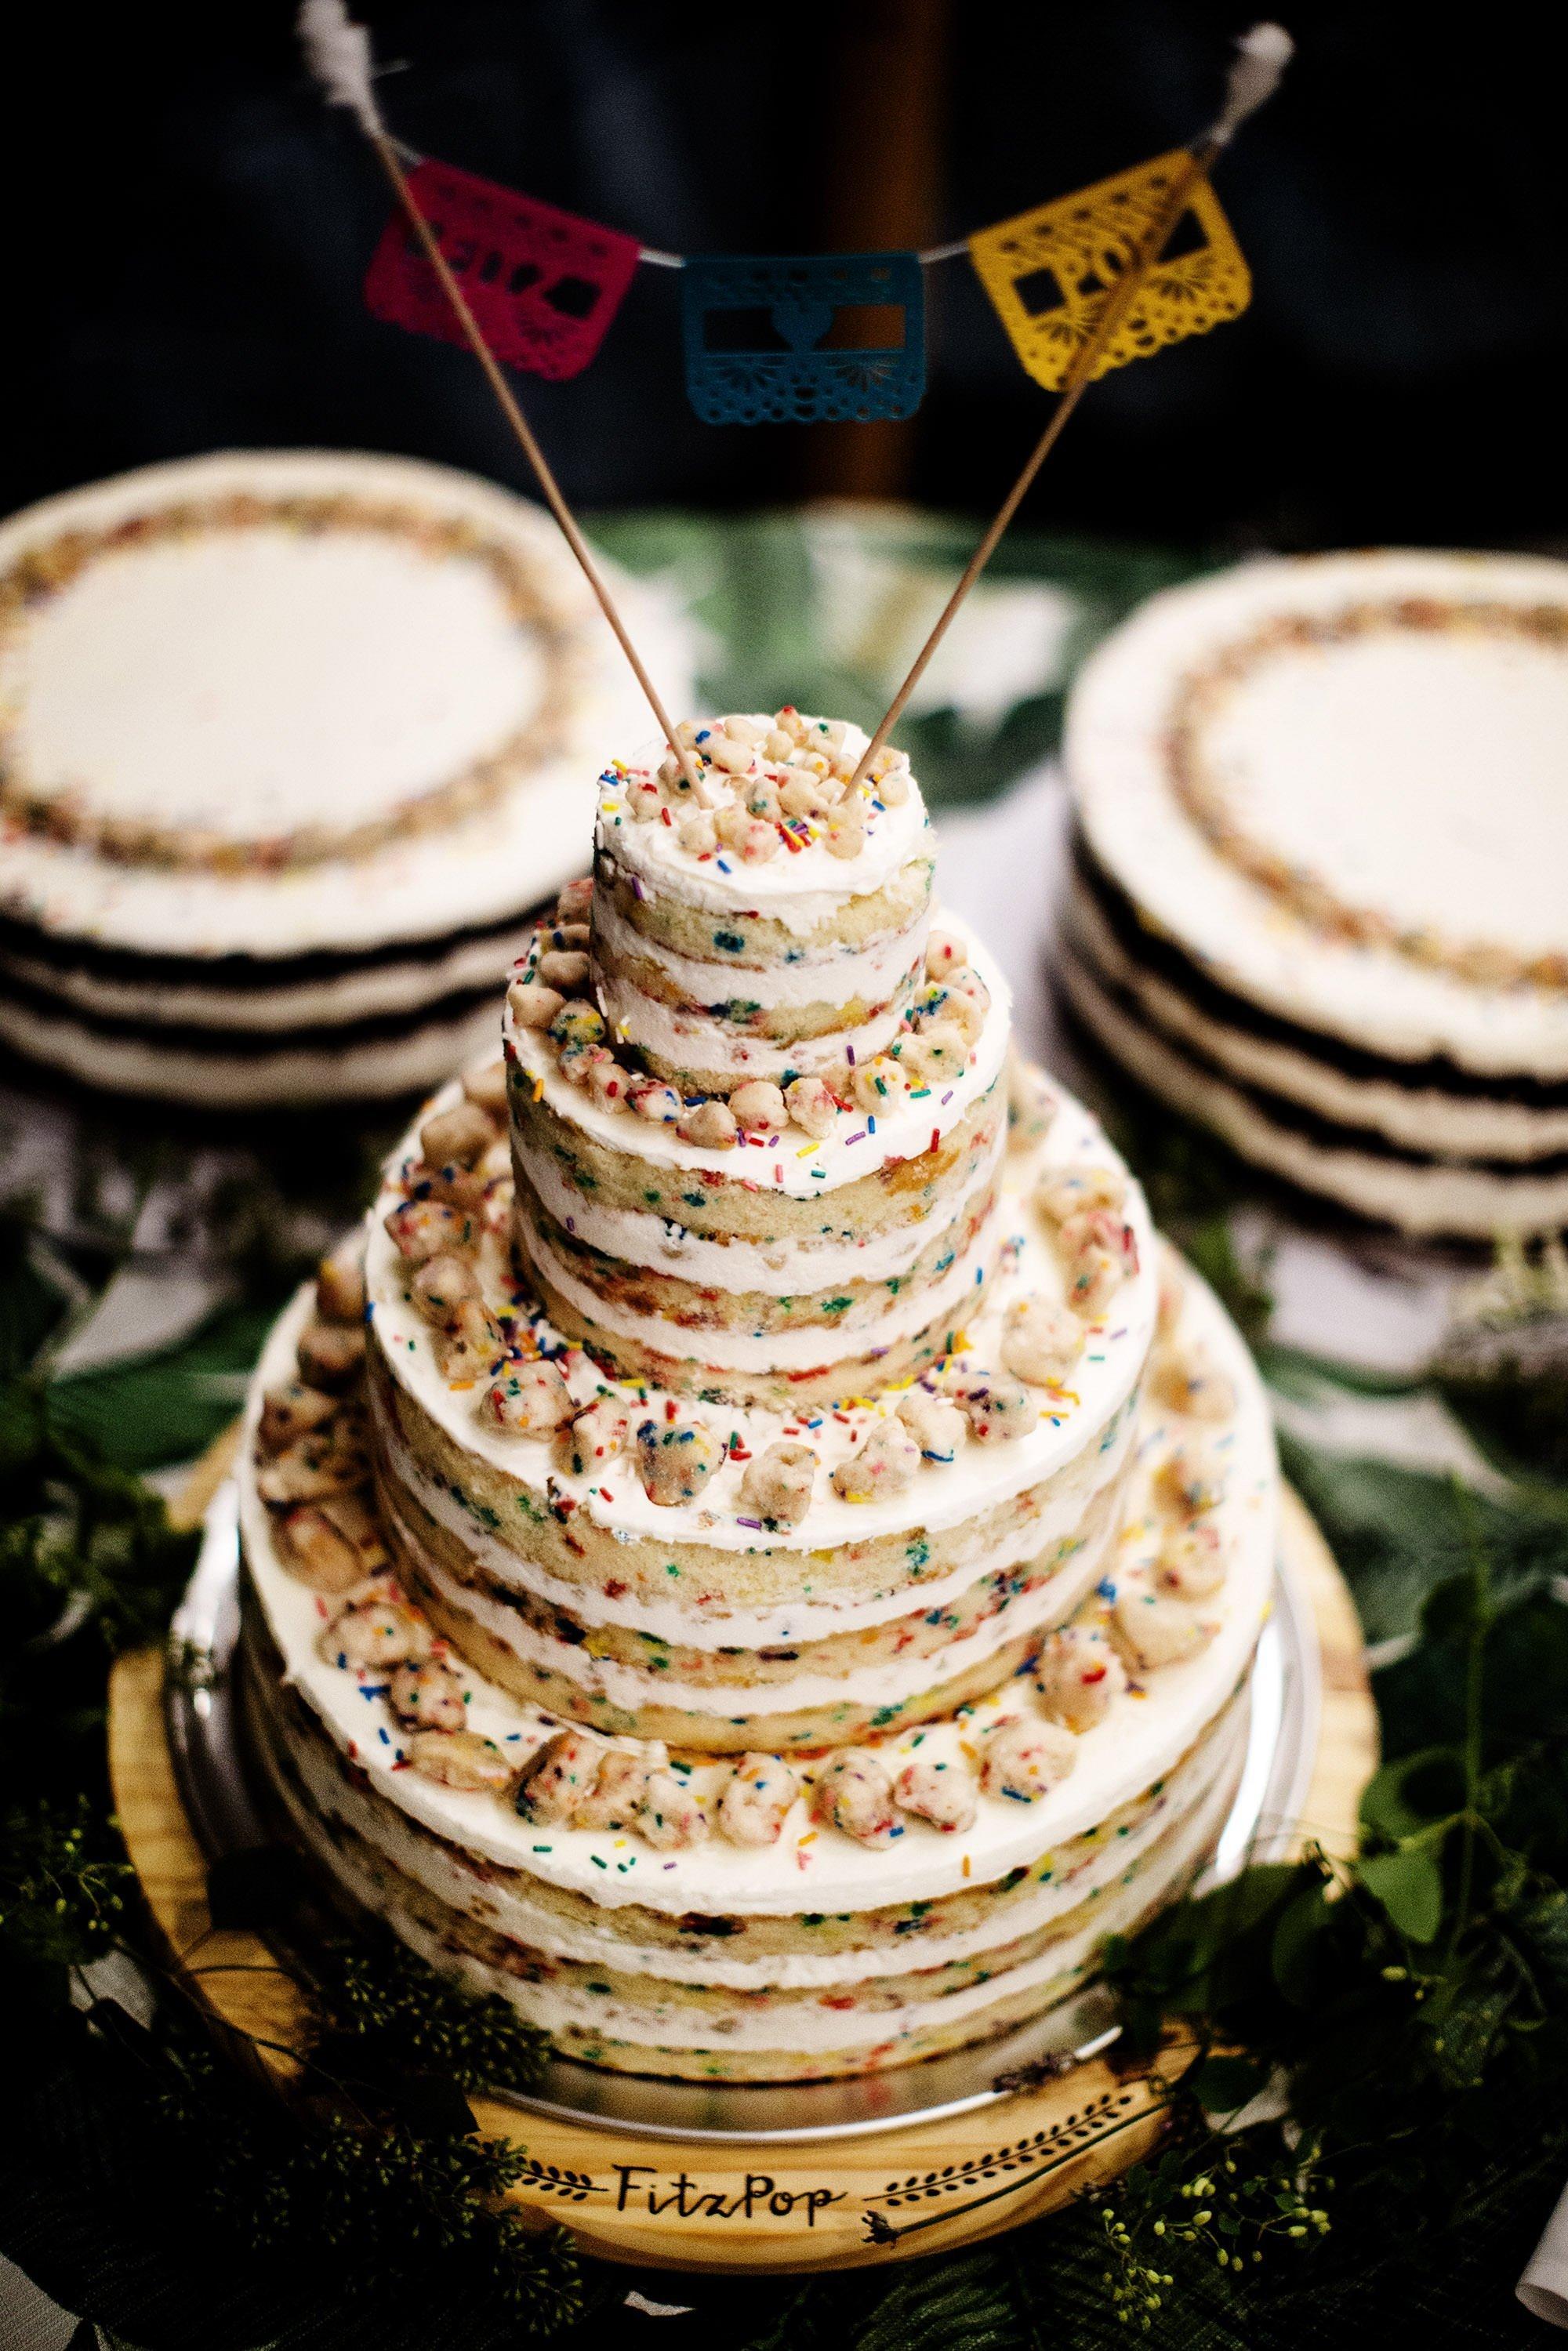 Chatham MA Wedding  I  Cape Cod Wedding  I  The Milk Bar cake.